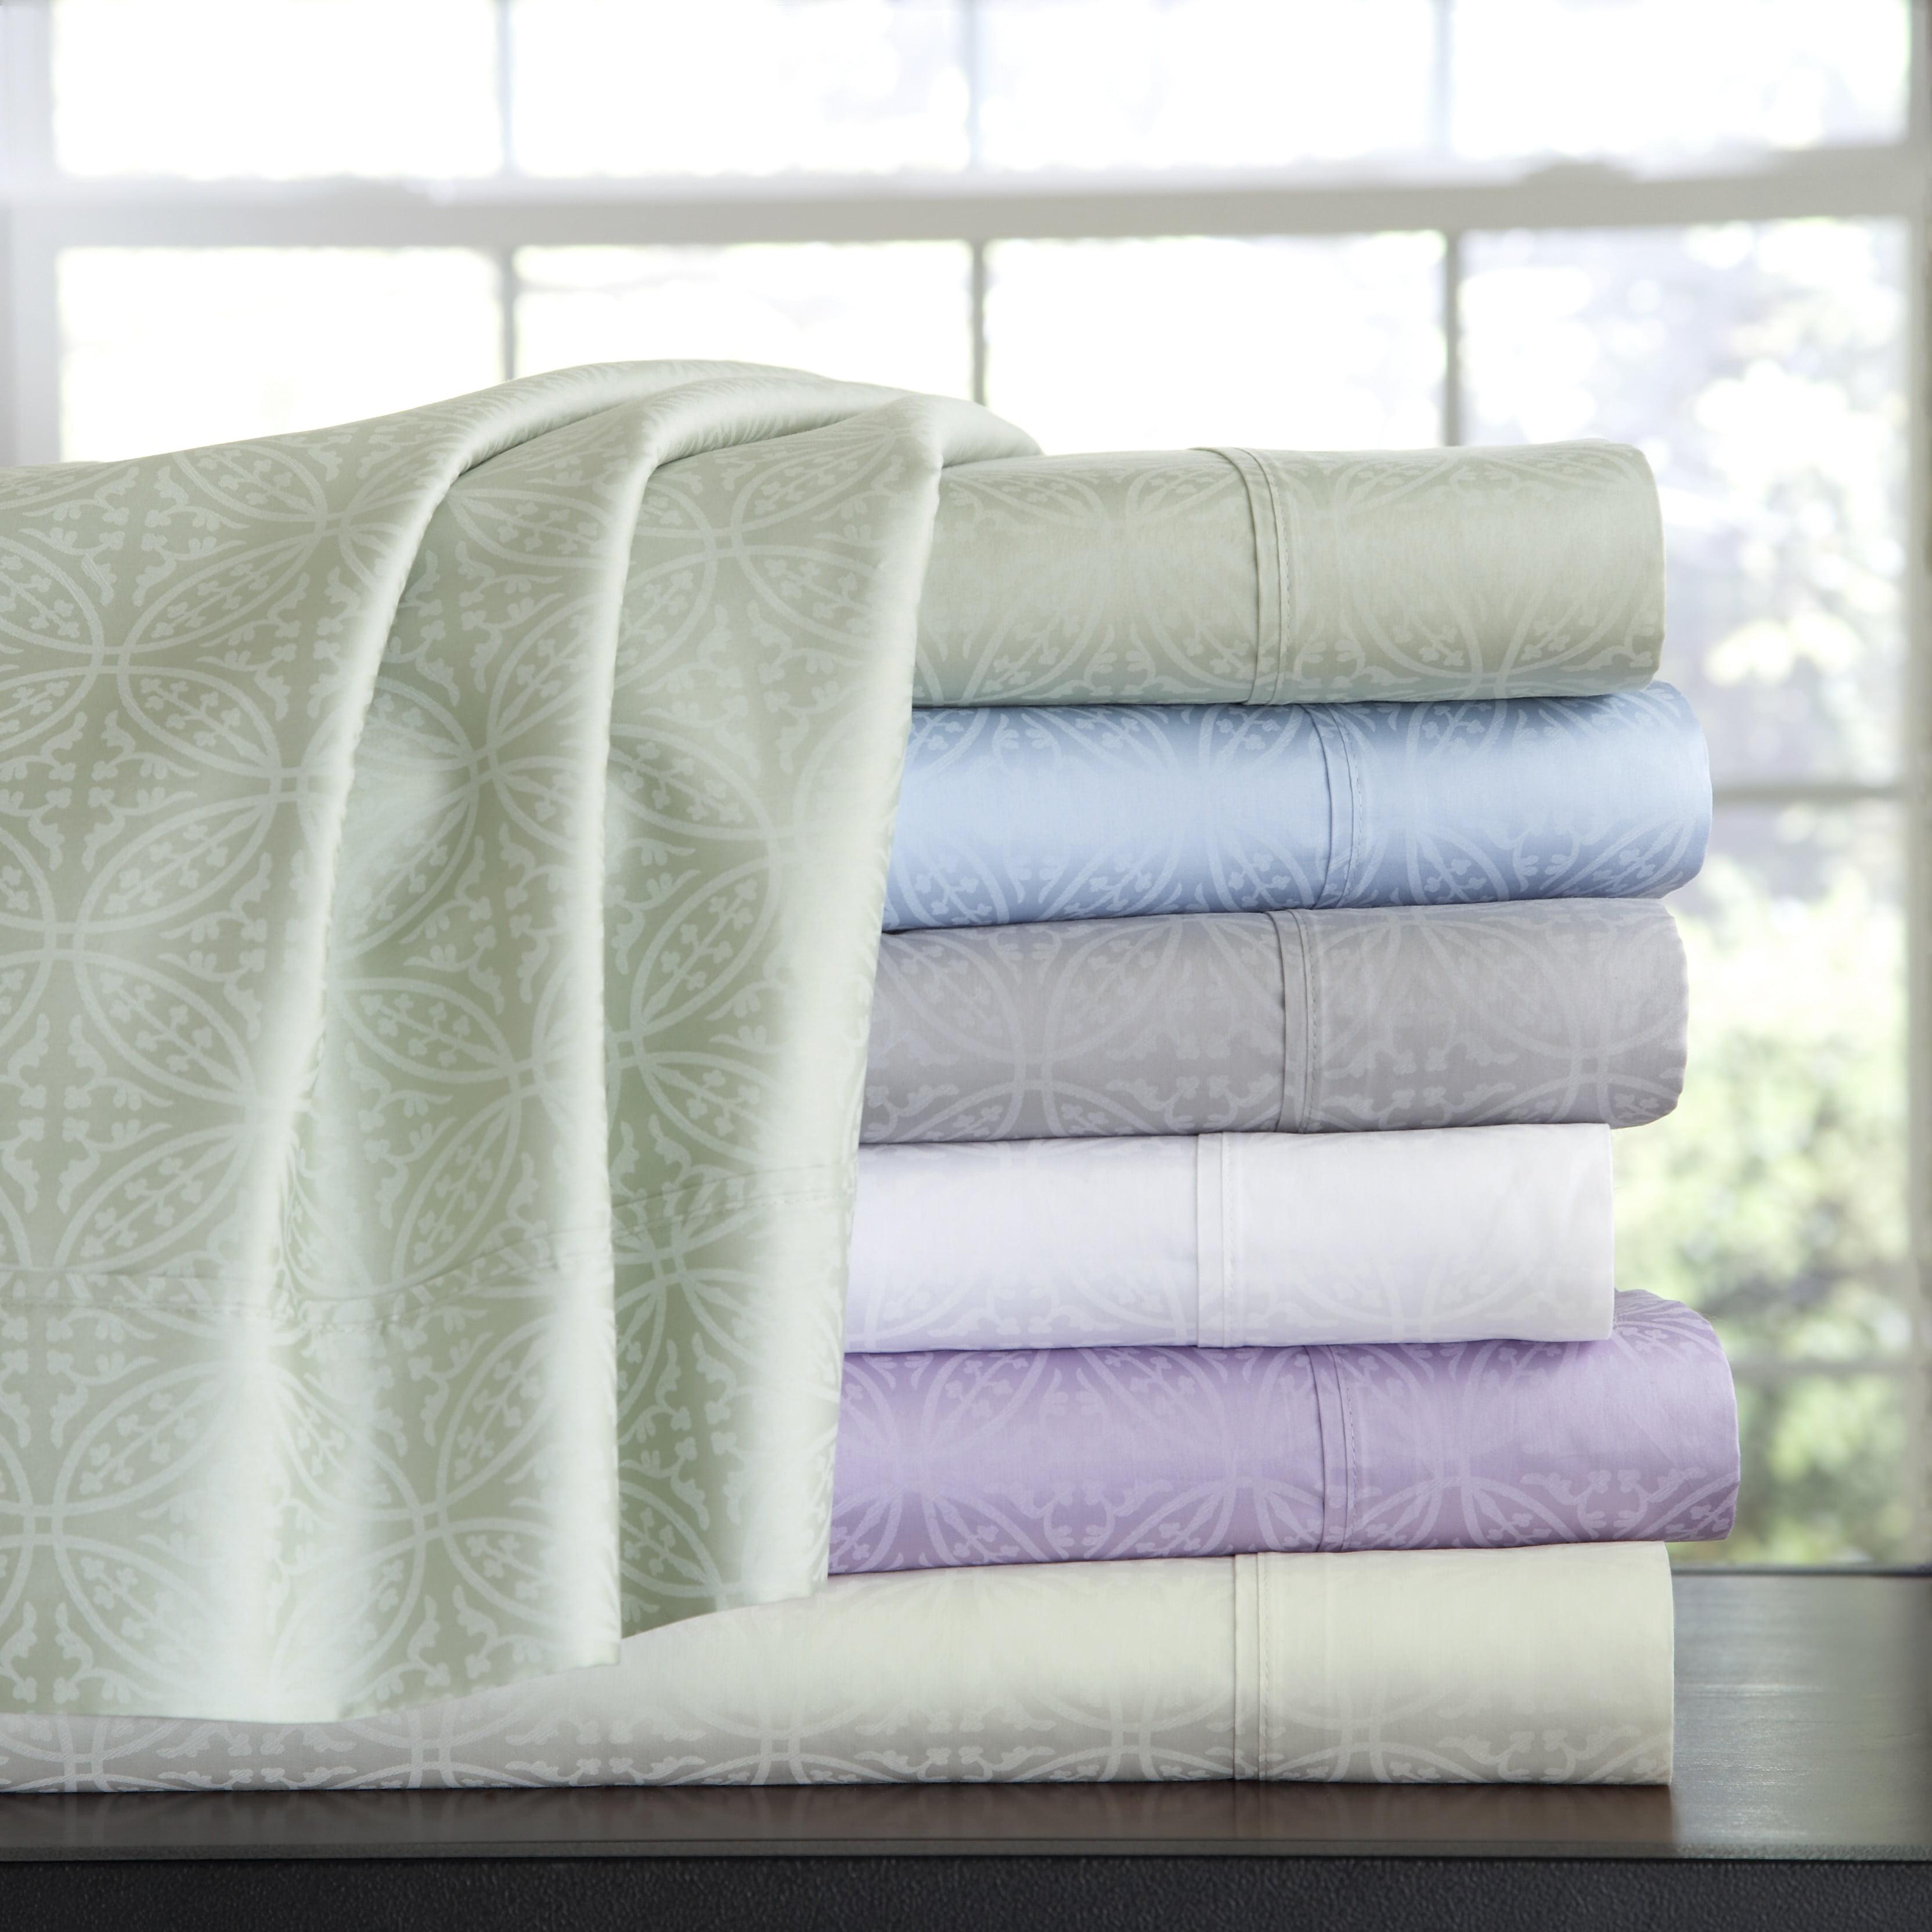 Pointehaven 300 Thread Count Cotton Tone-on-Tone Printed Sheet Set Full - Lavender